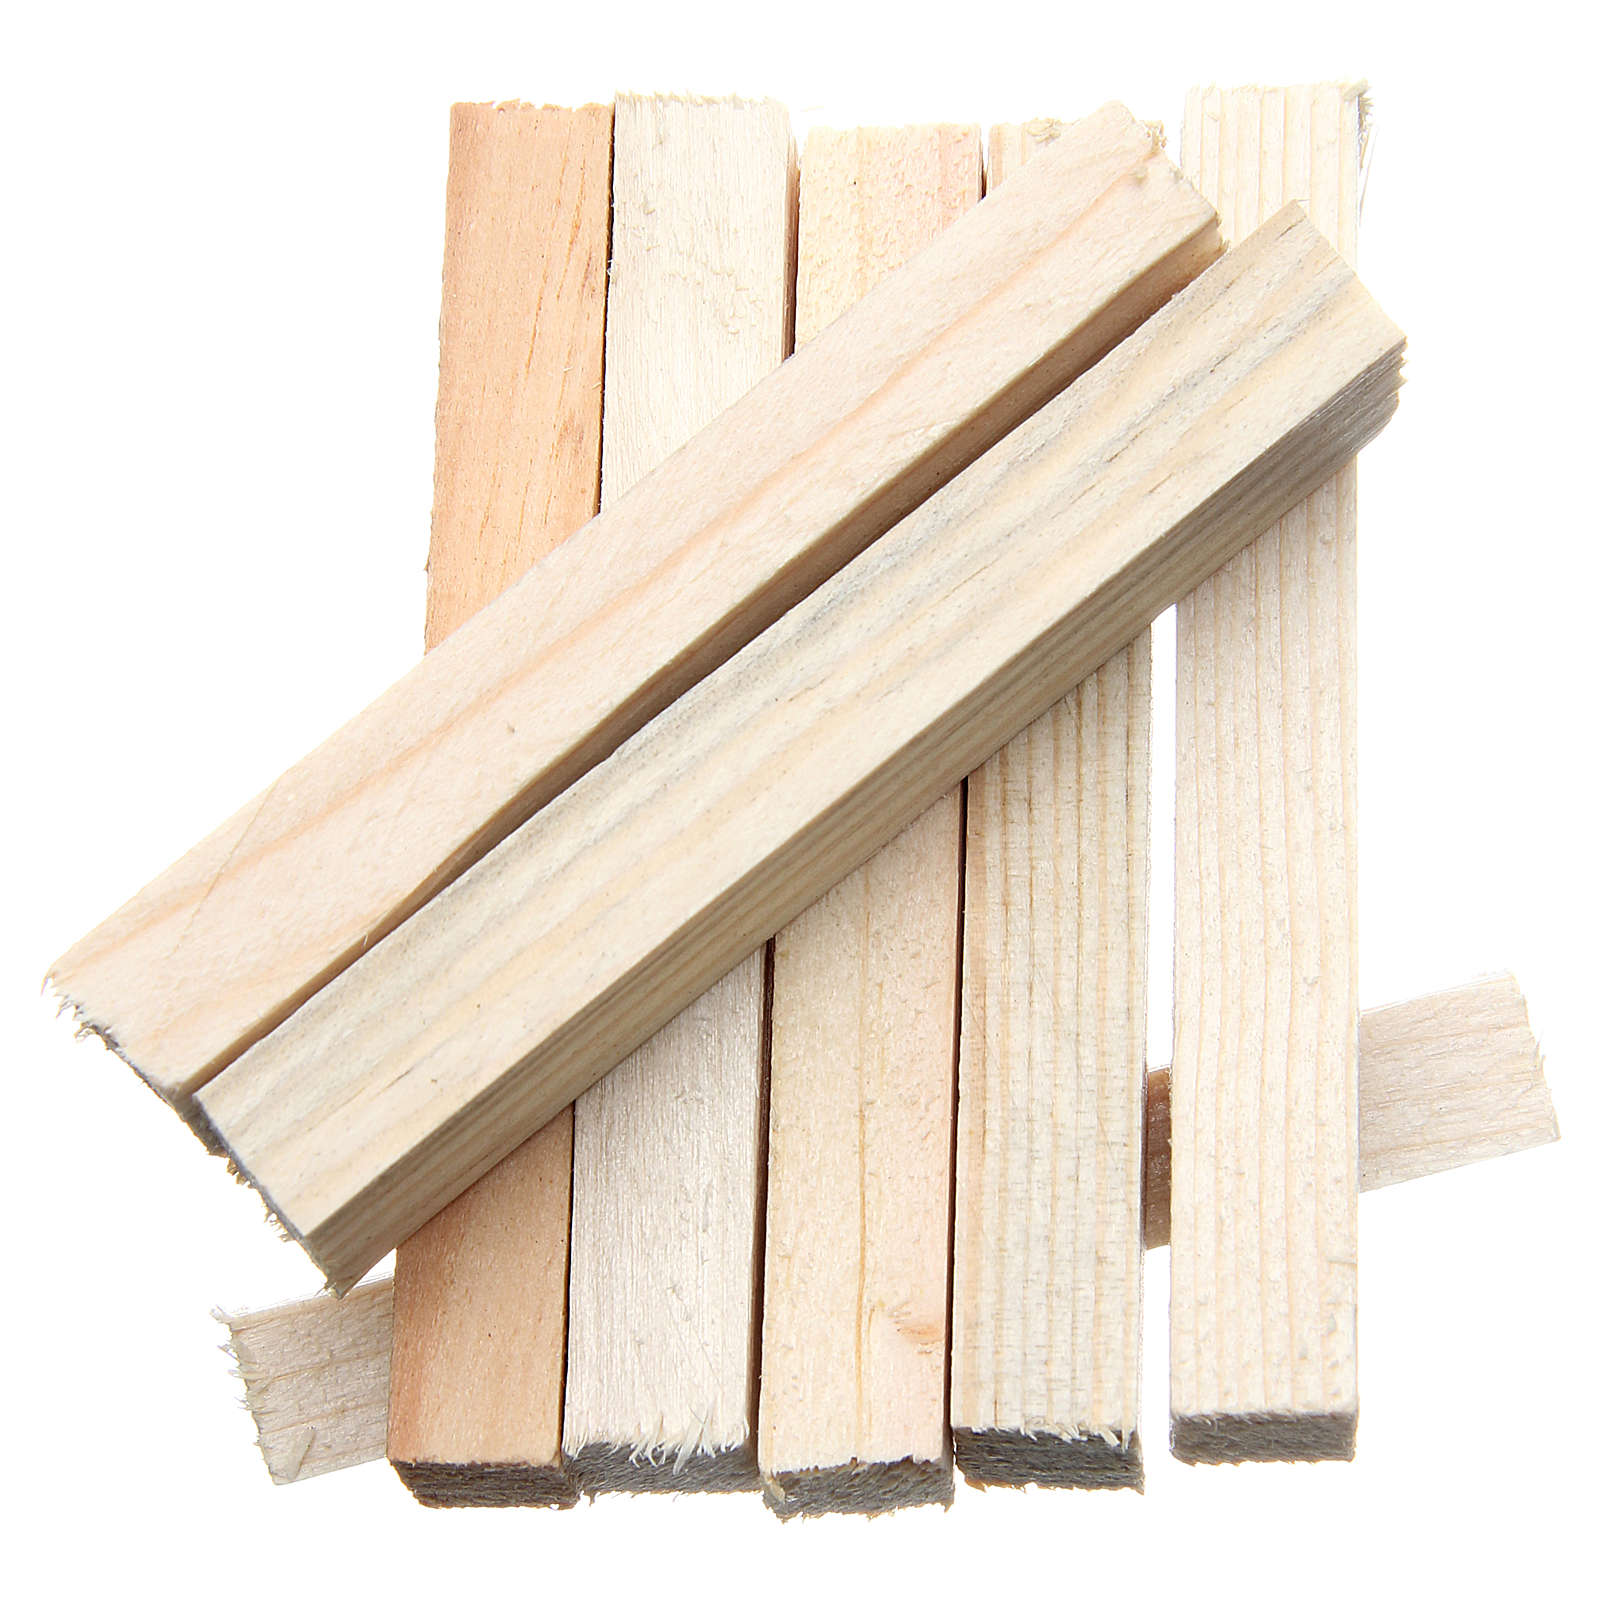 Listelli in legno presepe 8x1x1,5 cm set 8 pz 4